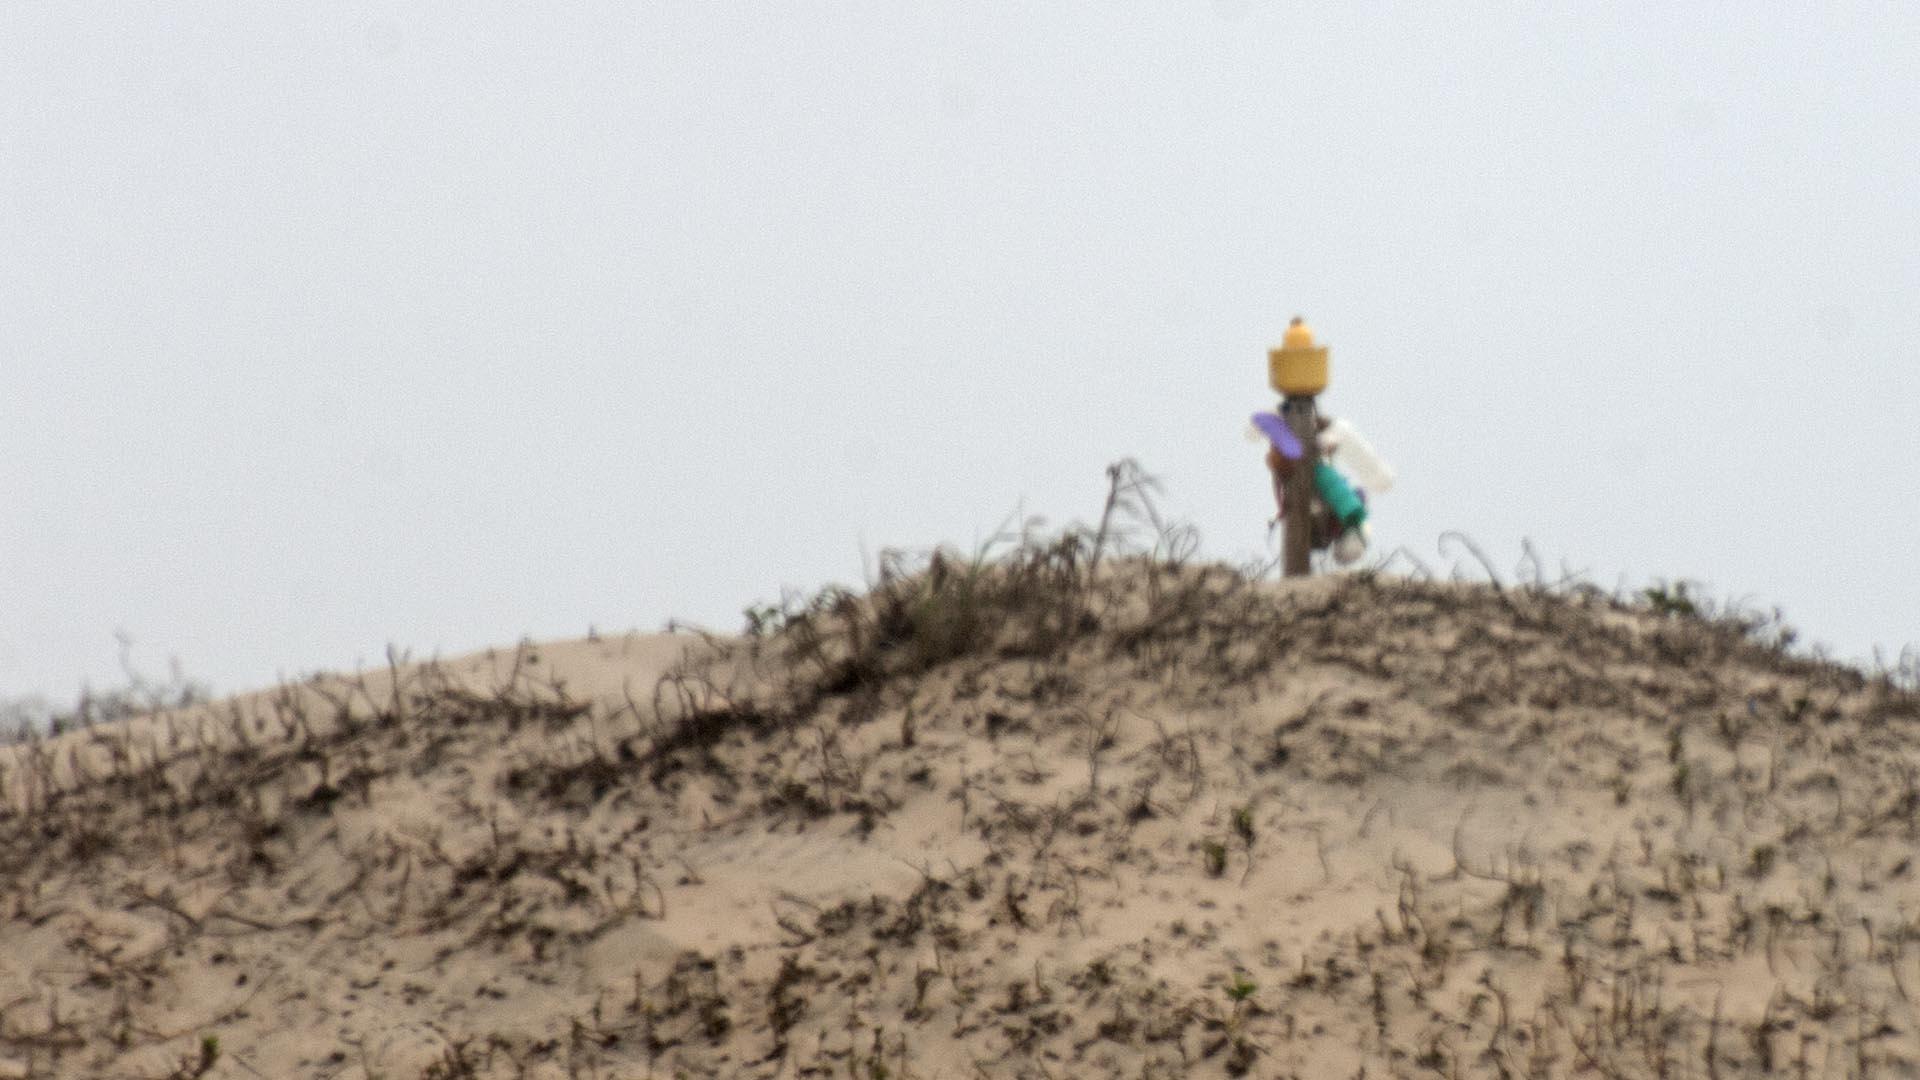 spi-beach-sculpture-in-the-dunes-tele